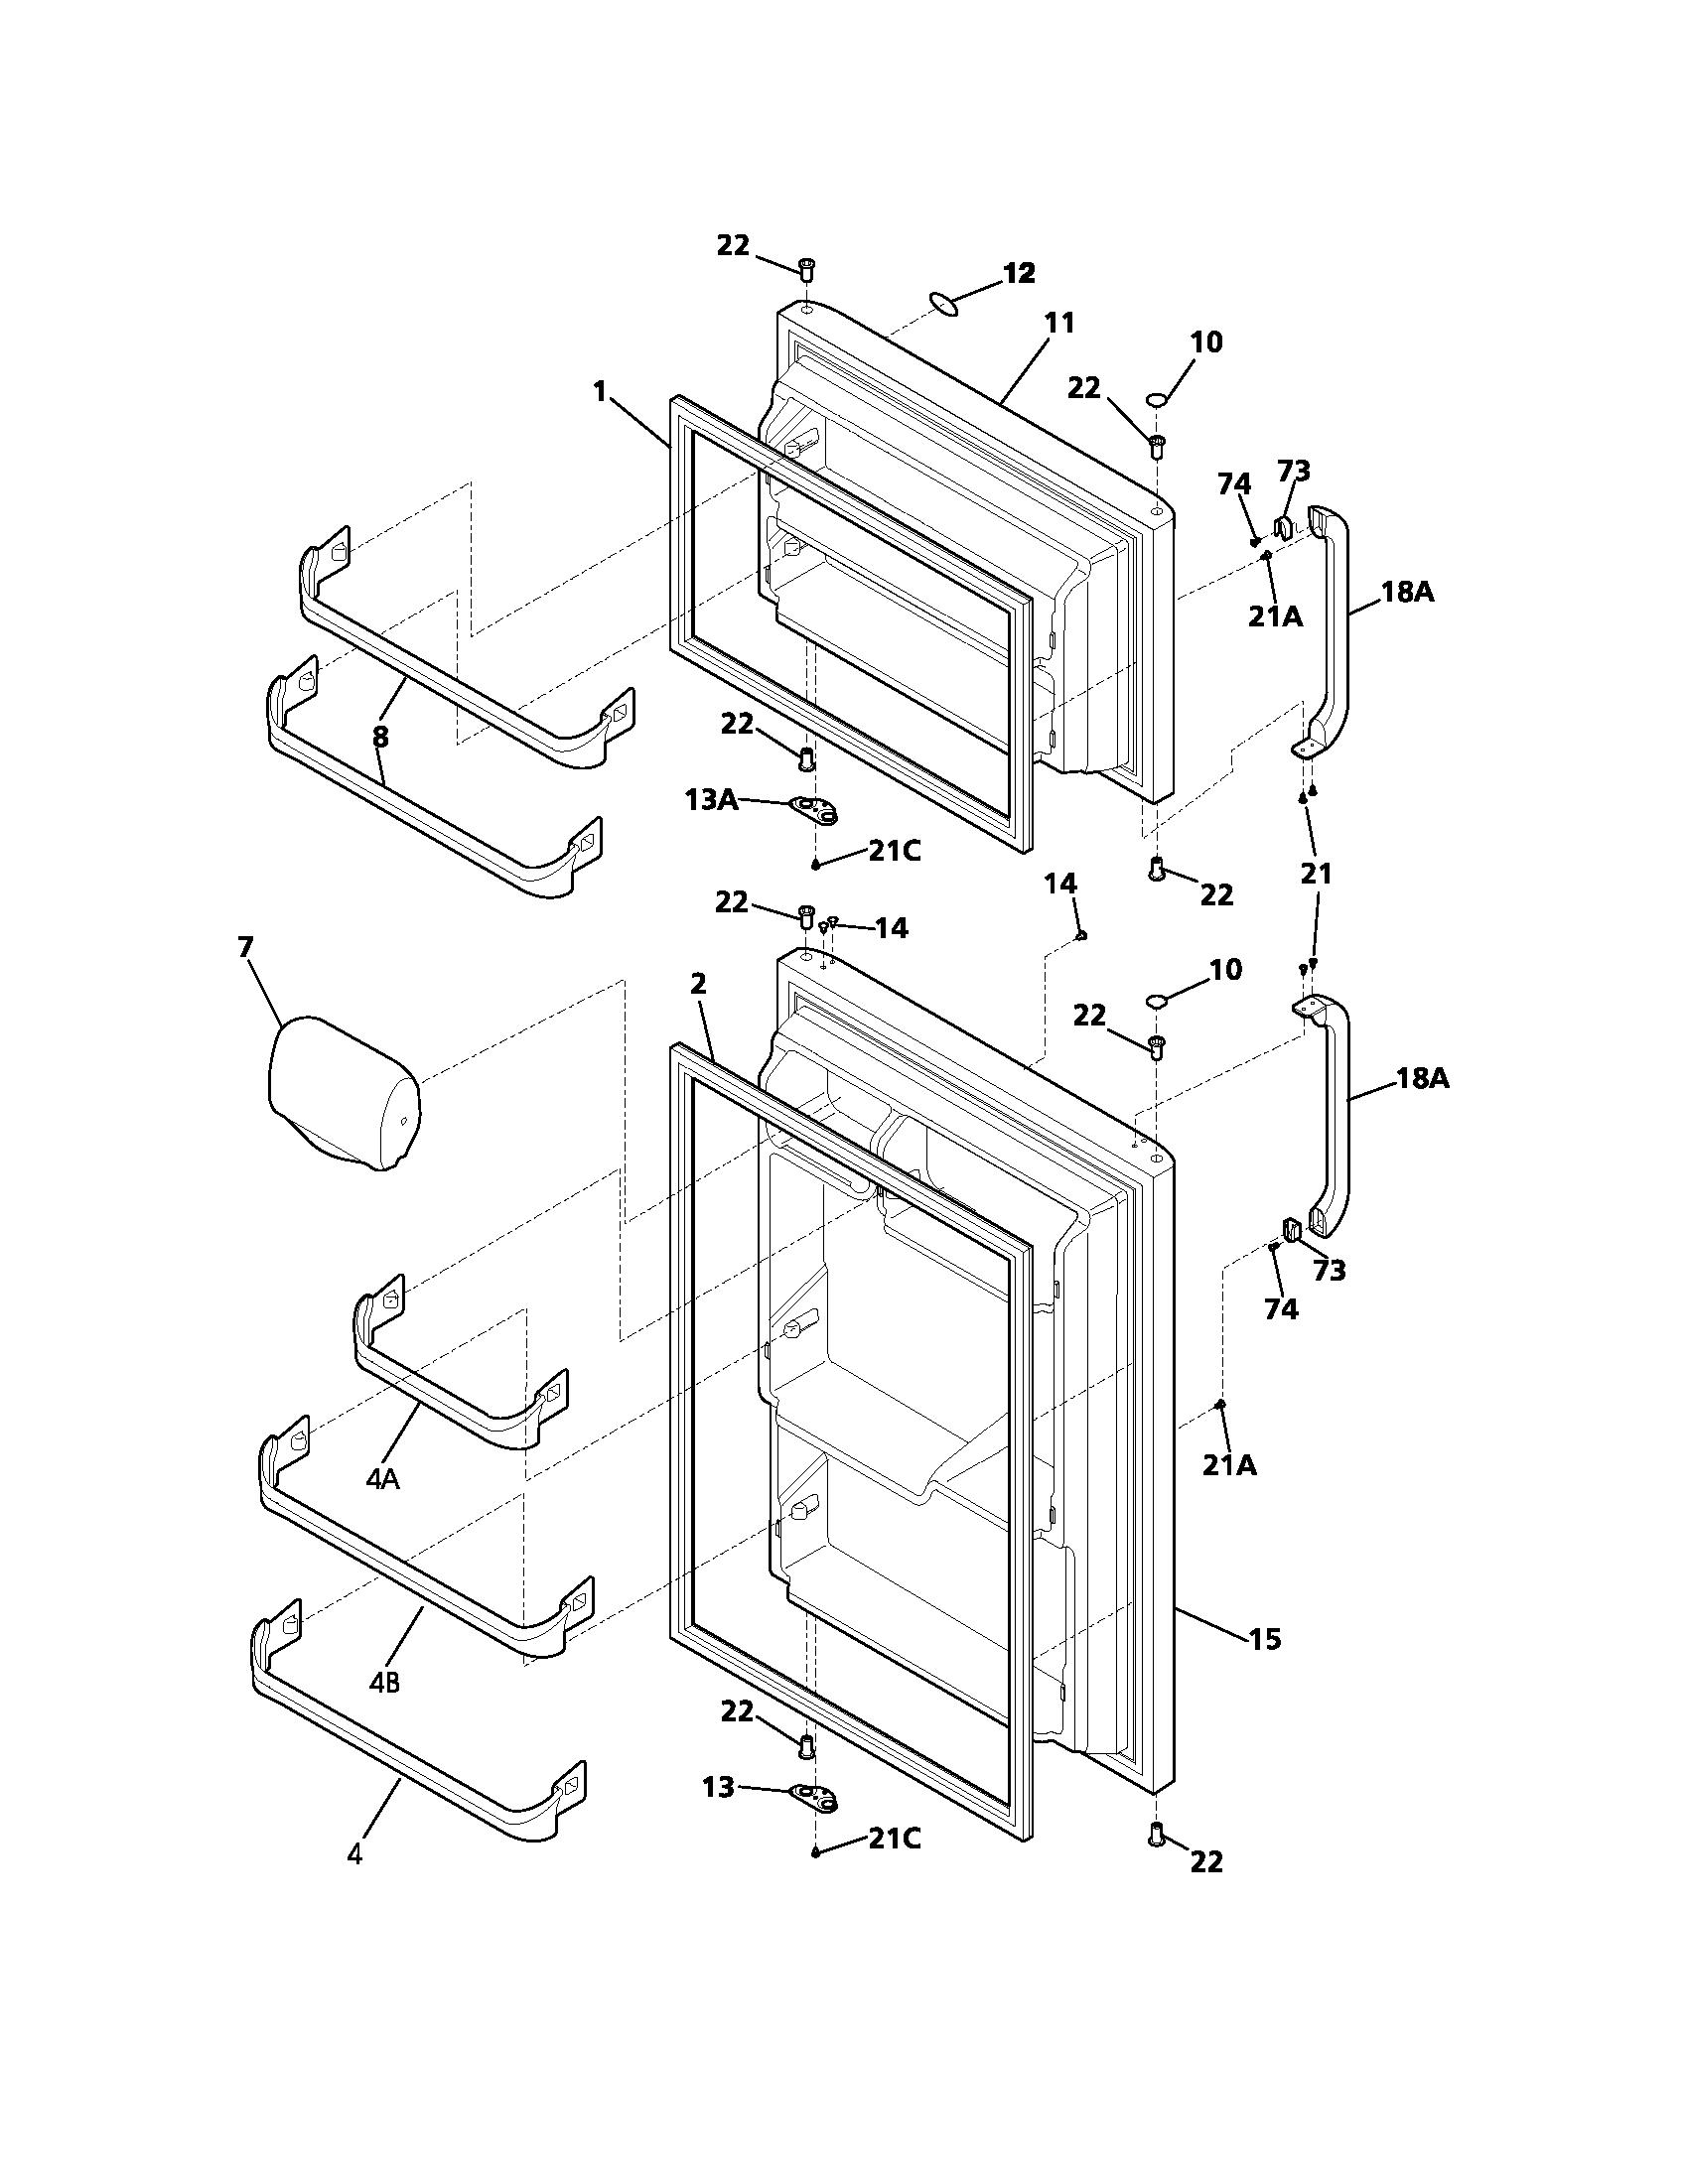 DOOR Diagram & Parts List for Model frt15b3aw5 Frigidaire